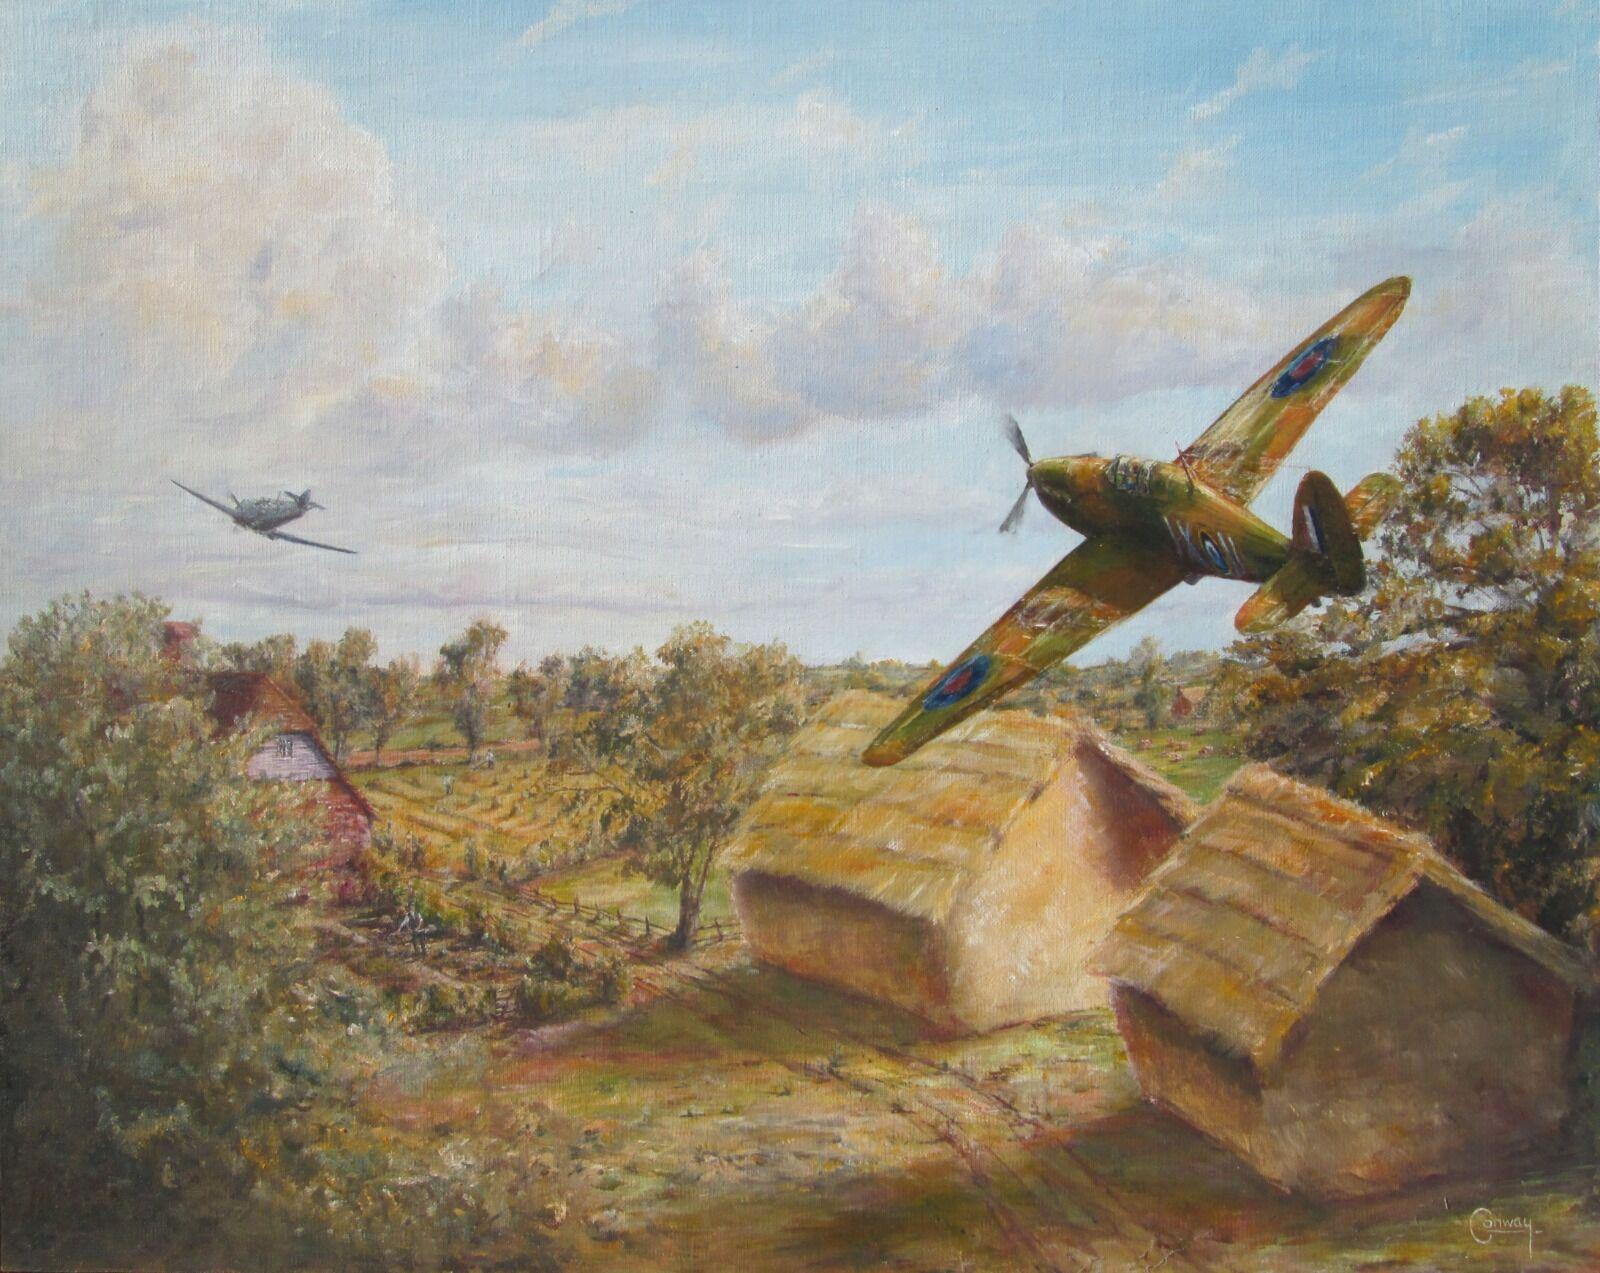 'The Long Chase' - Hurricane of Sq/L. David Alwyne Pemberton, No. 1 Squadron